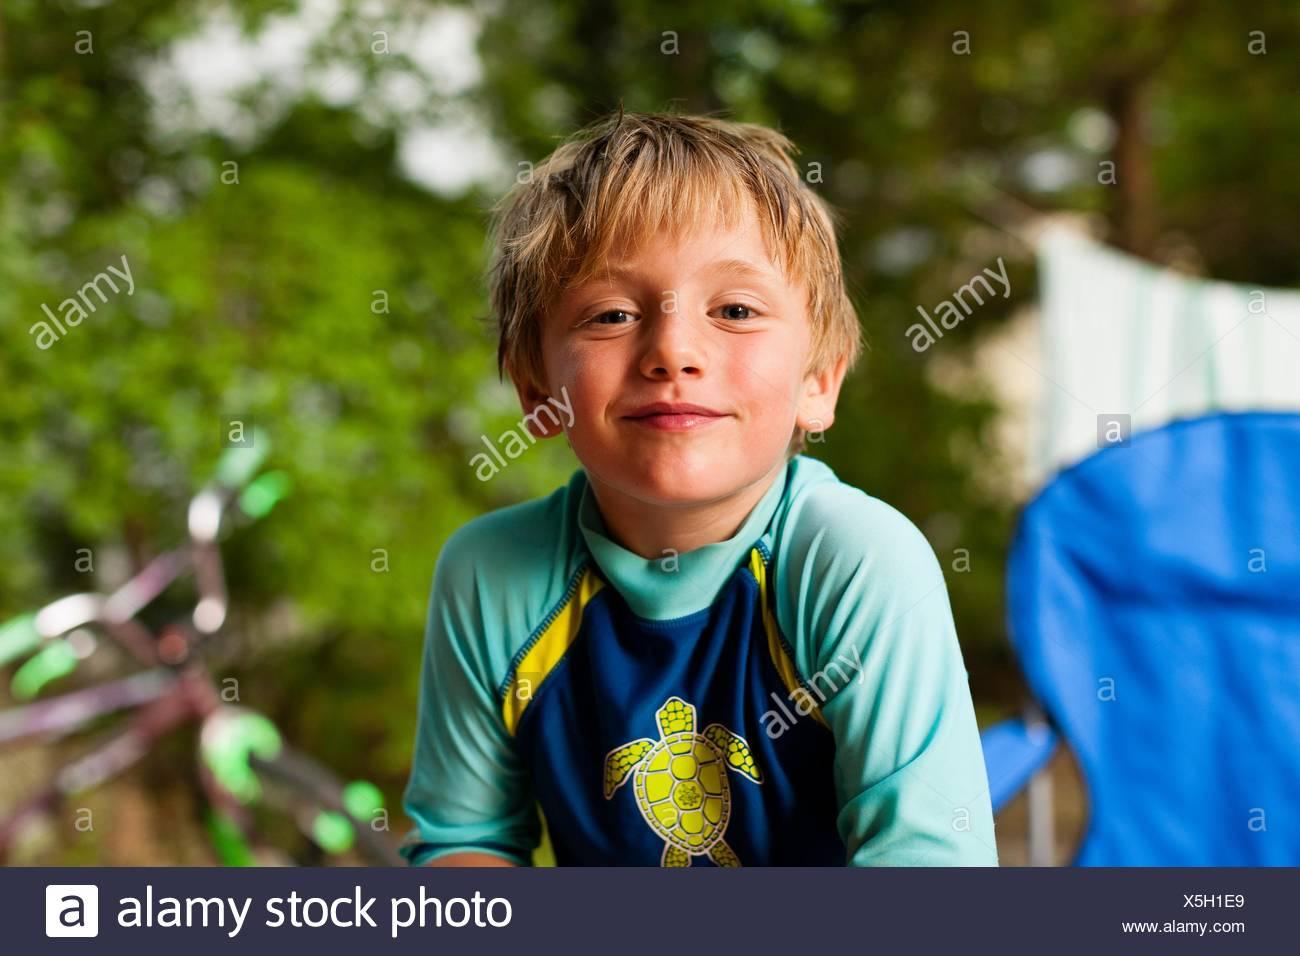 Portrait of boy wearing swimwear looking at camera smiling Stock Photo